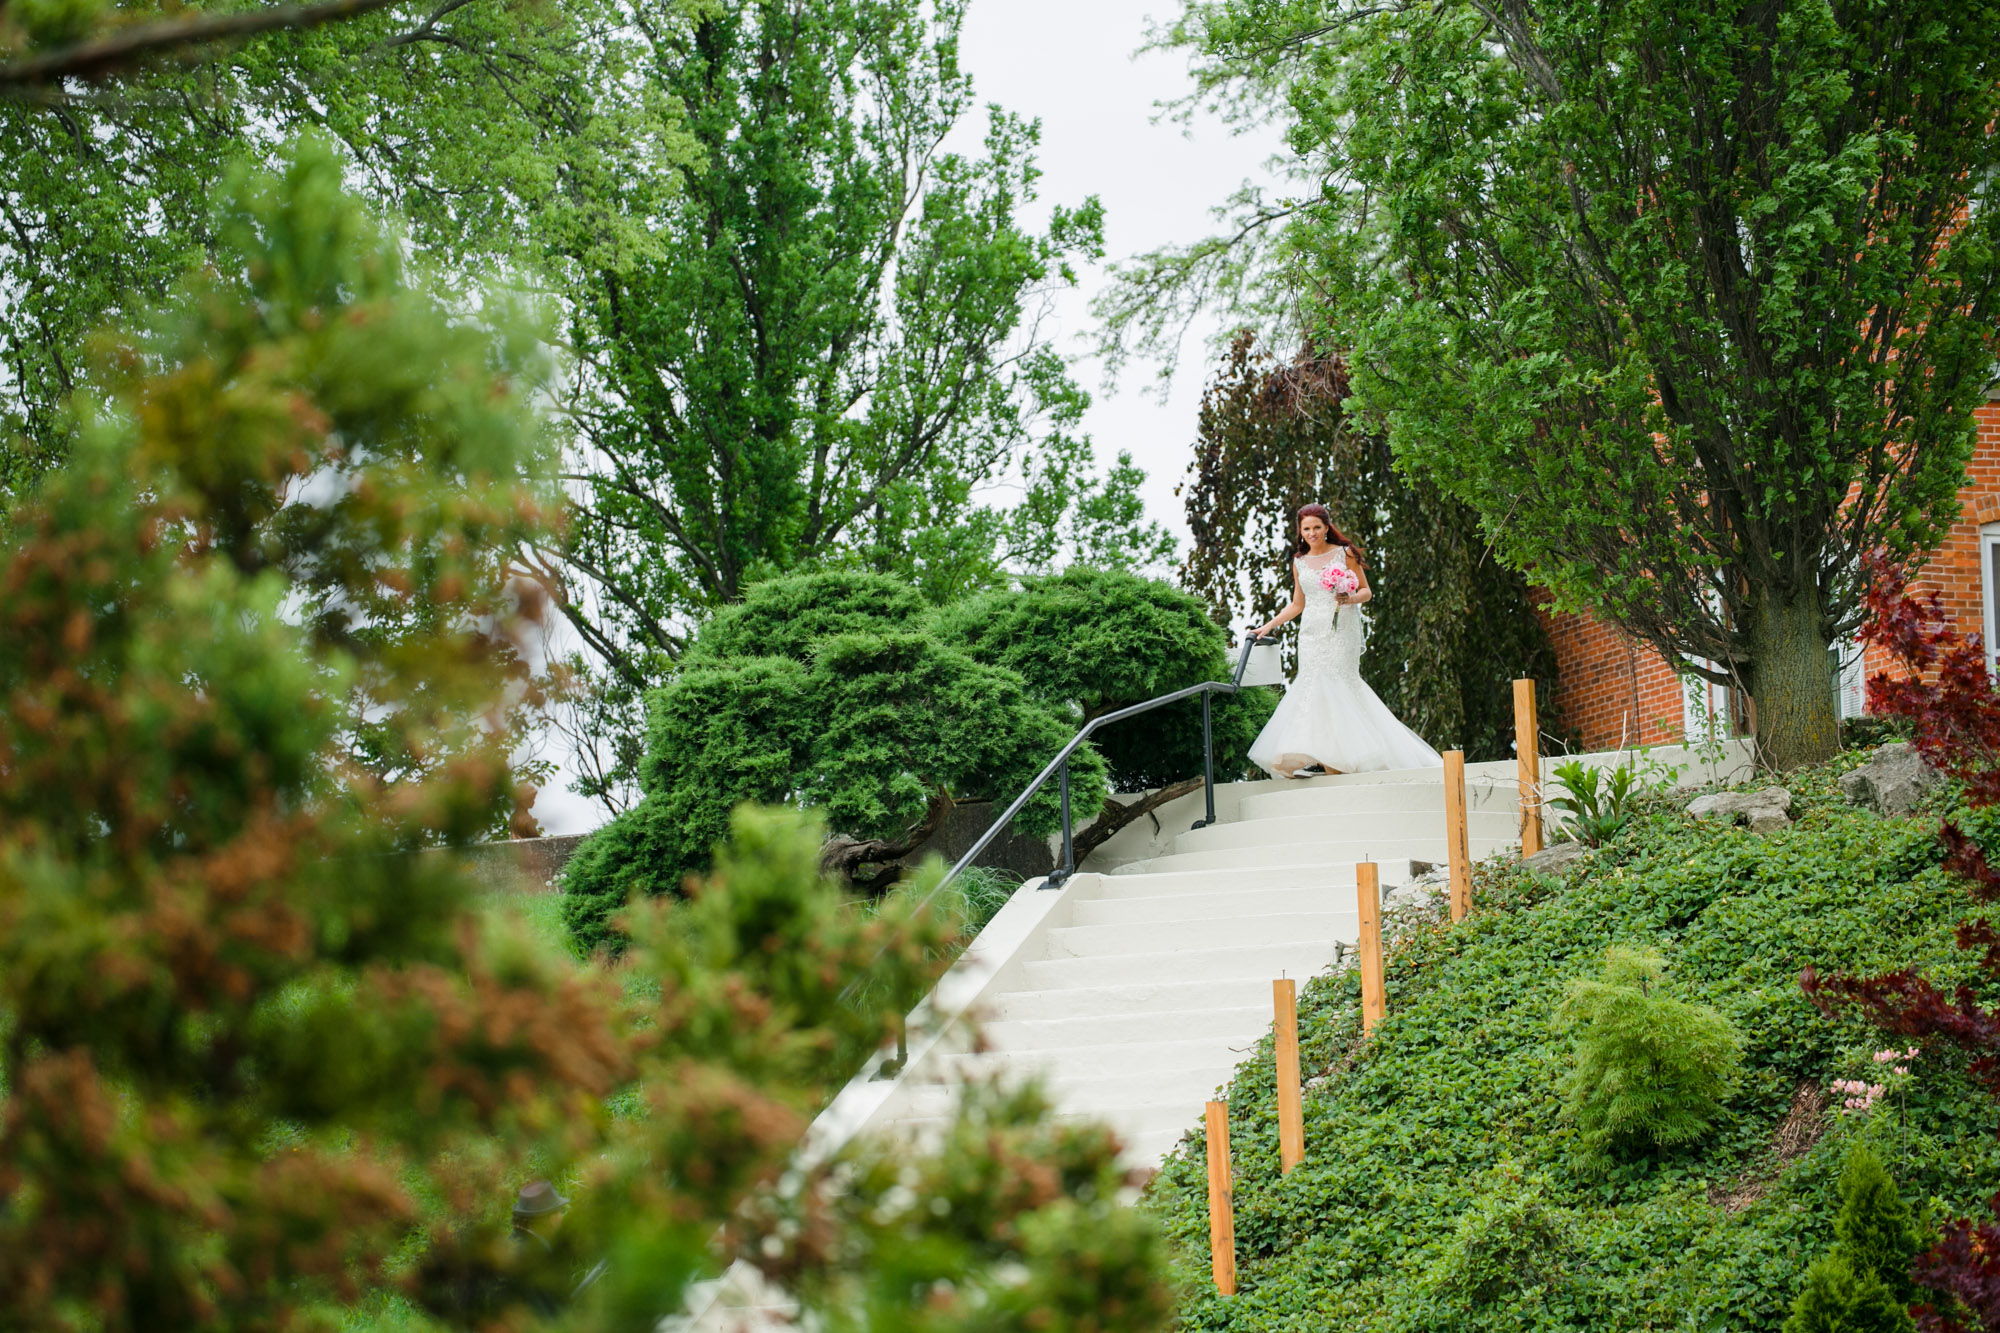 hensville-wedding-downtown-toledo-ohio (32 of 103).jpg